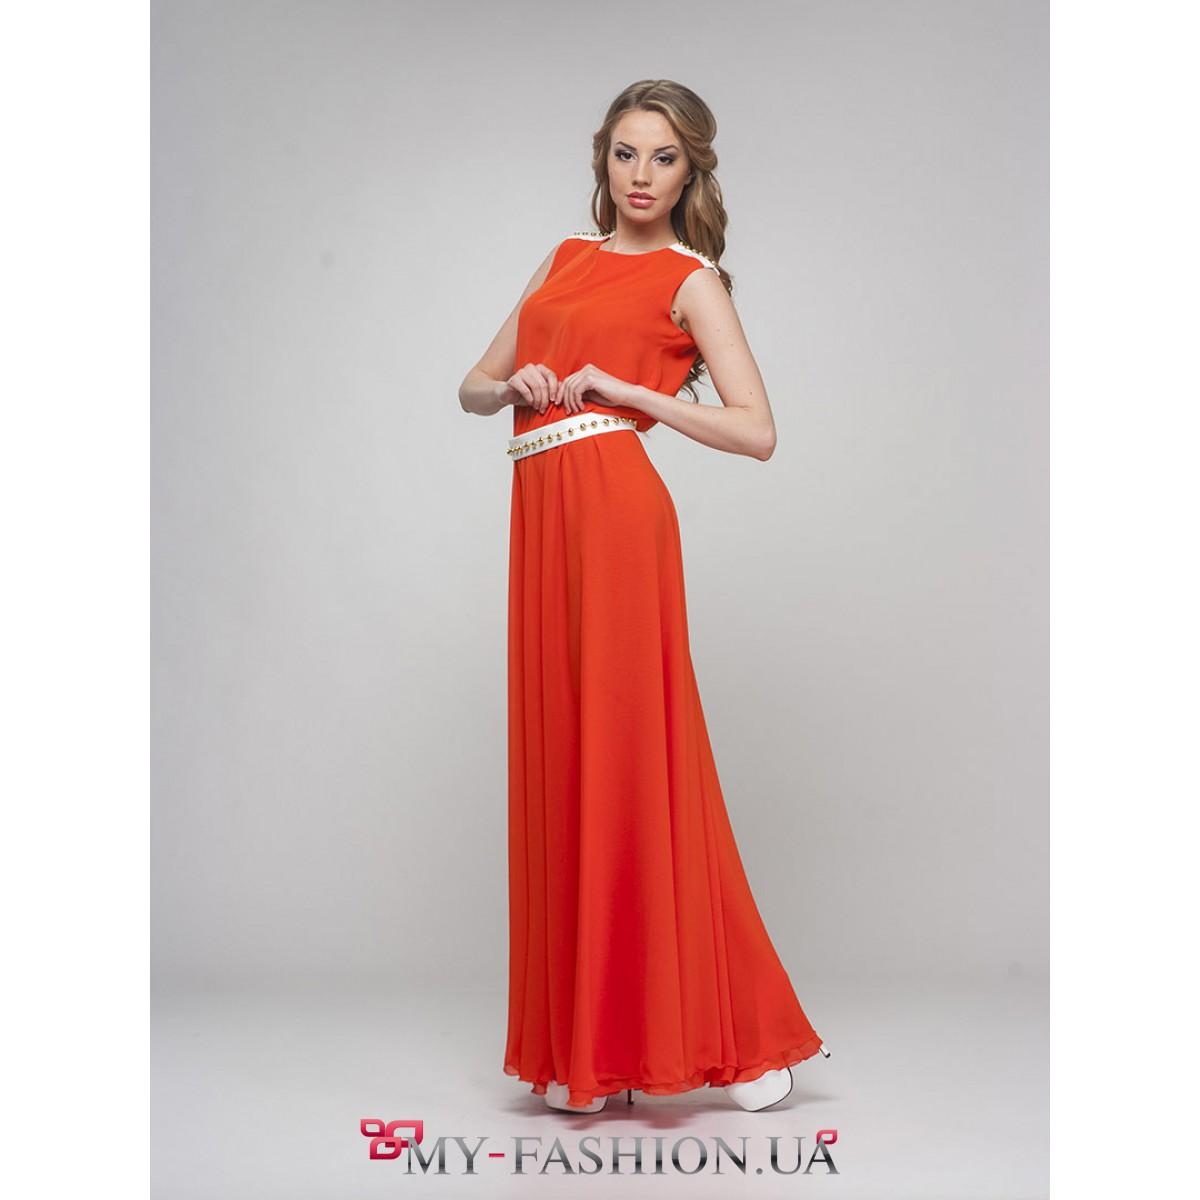 https://my-fashion.ua/image/cache/data/levoni/levo-0541-dress-3056-woomen-03-1200x1200.jpg